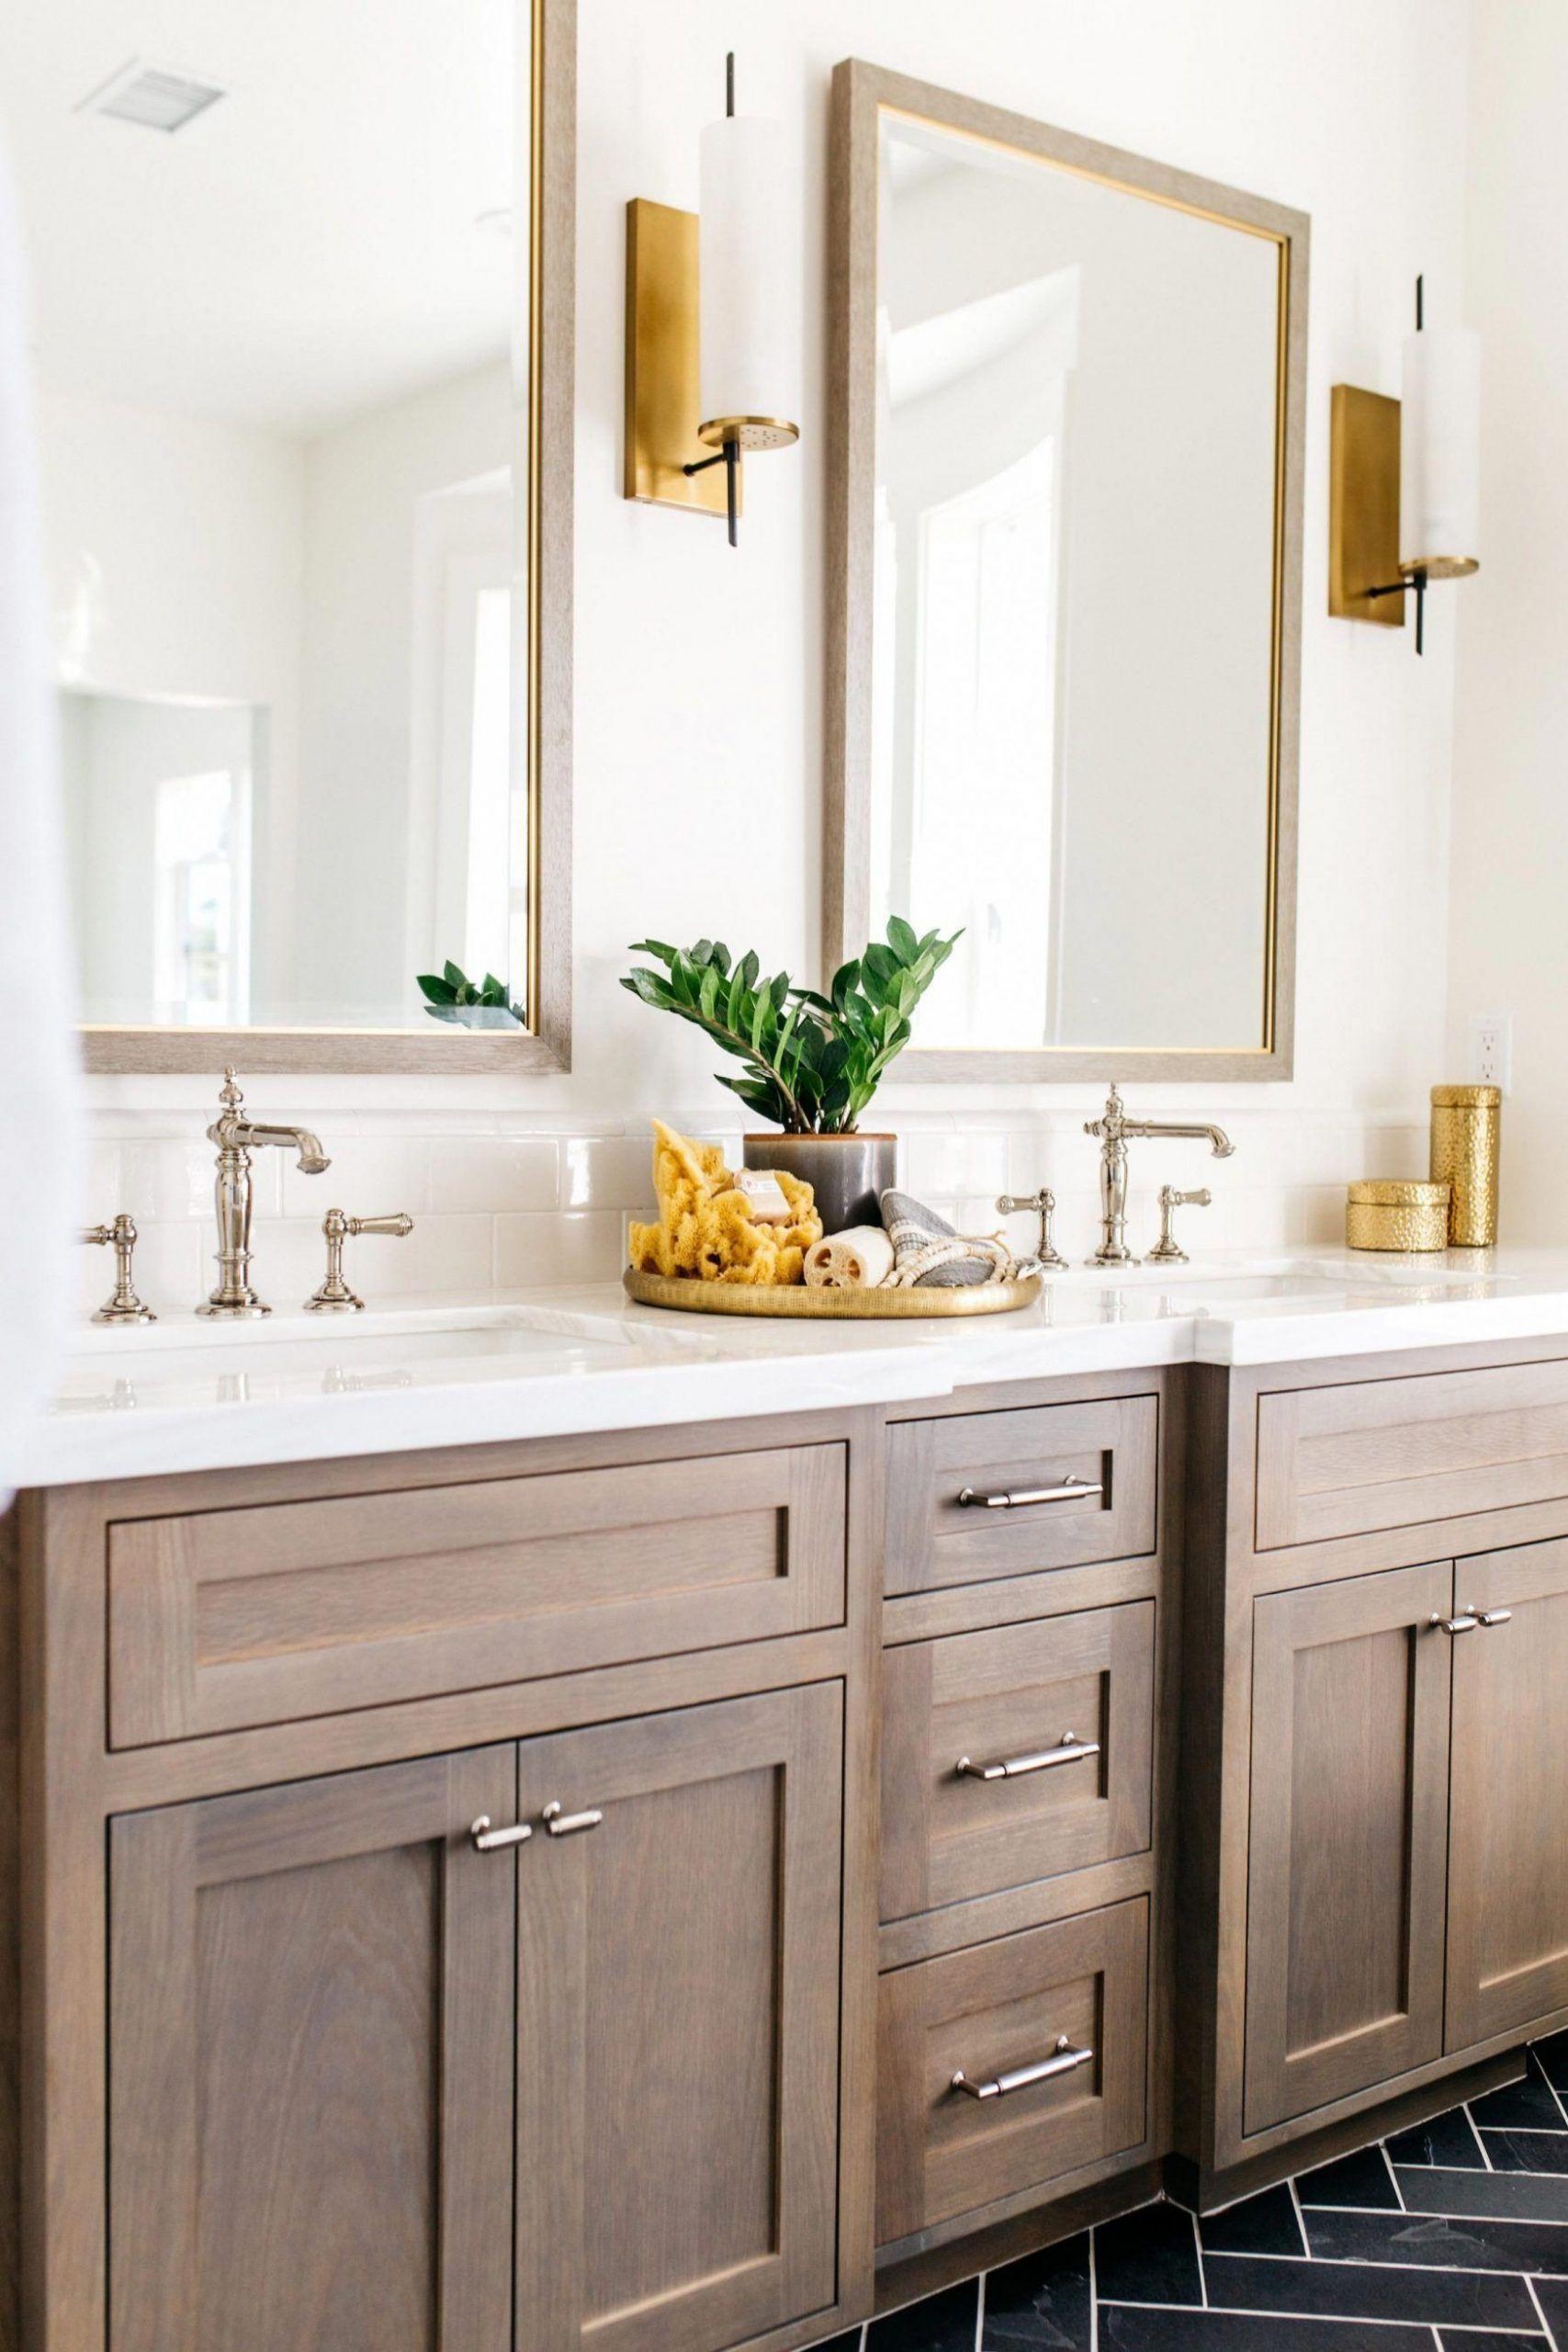 Decorpad Bathroom Floor  Bathroom cabinets designs, Bathroom